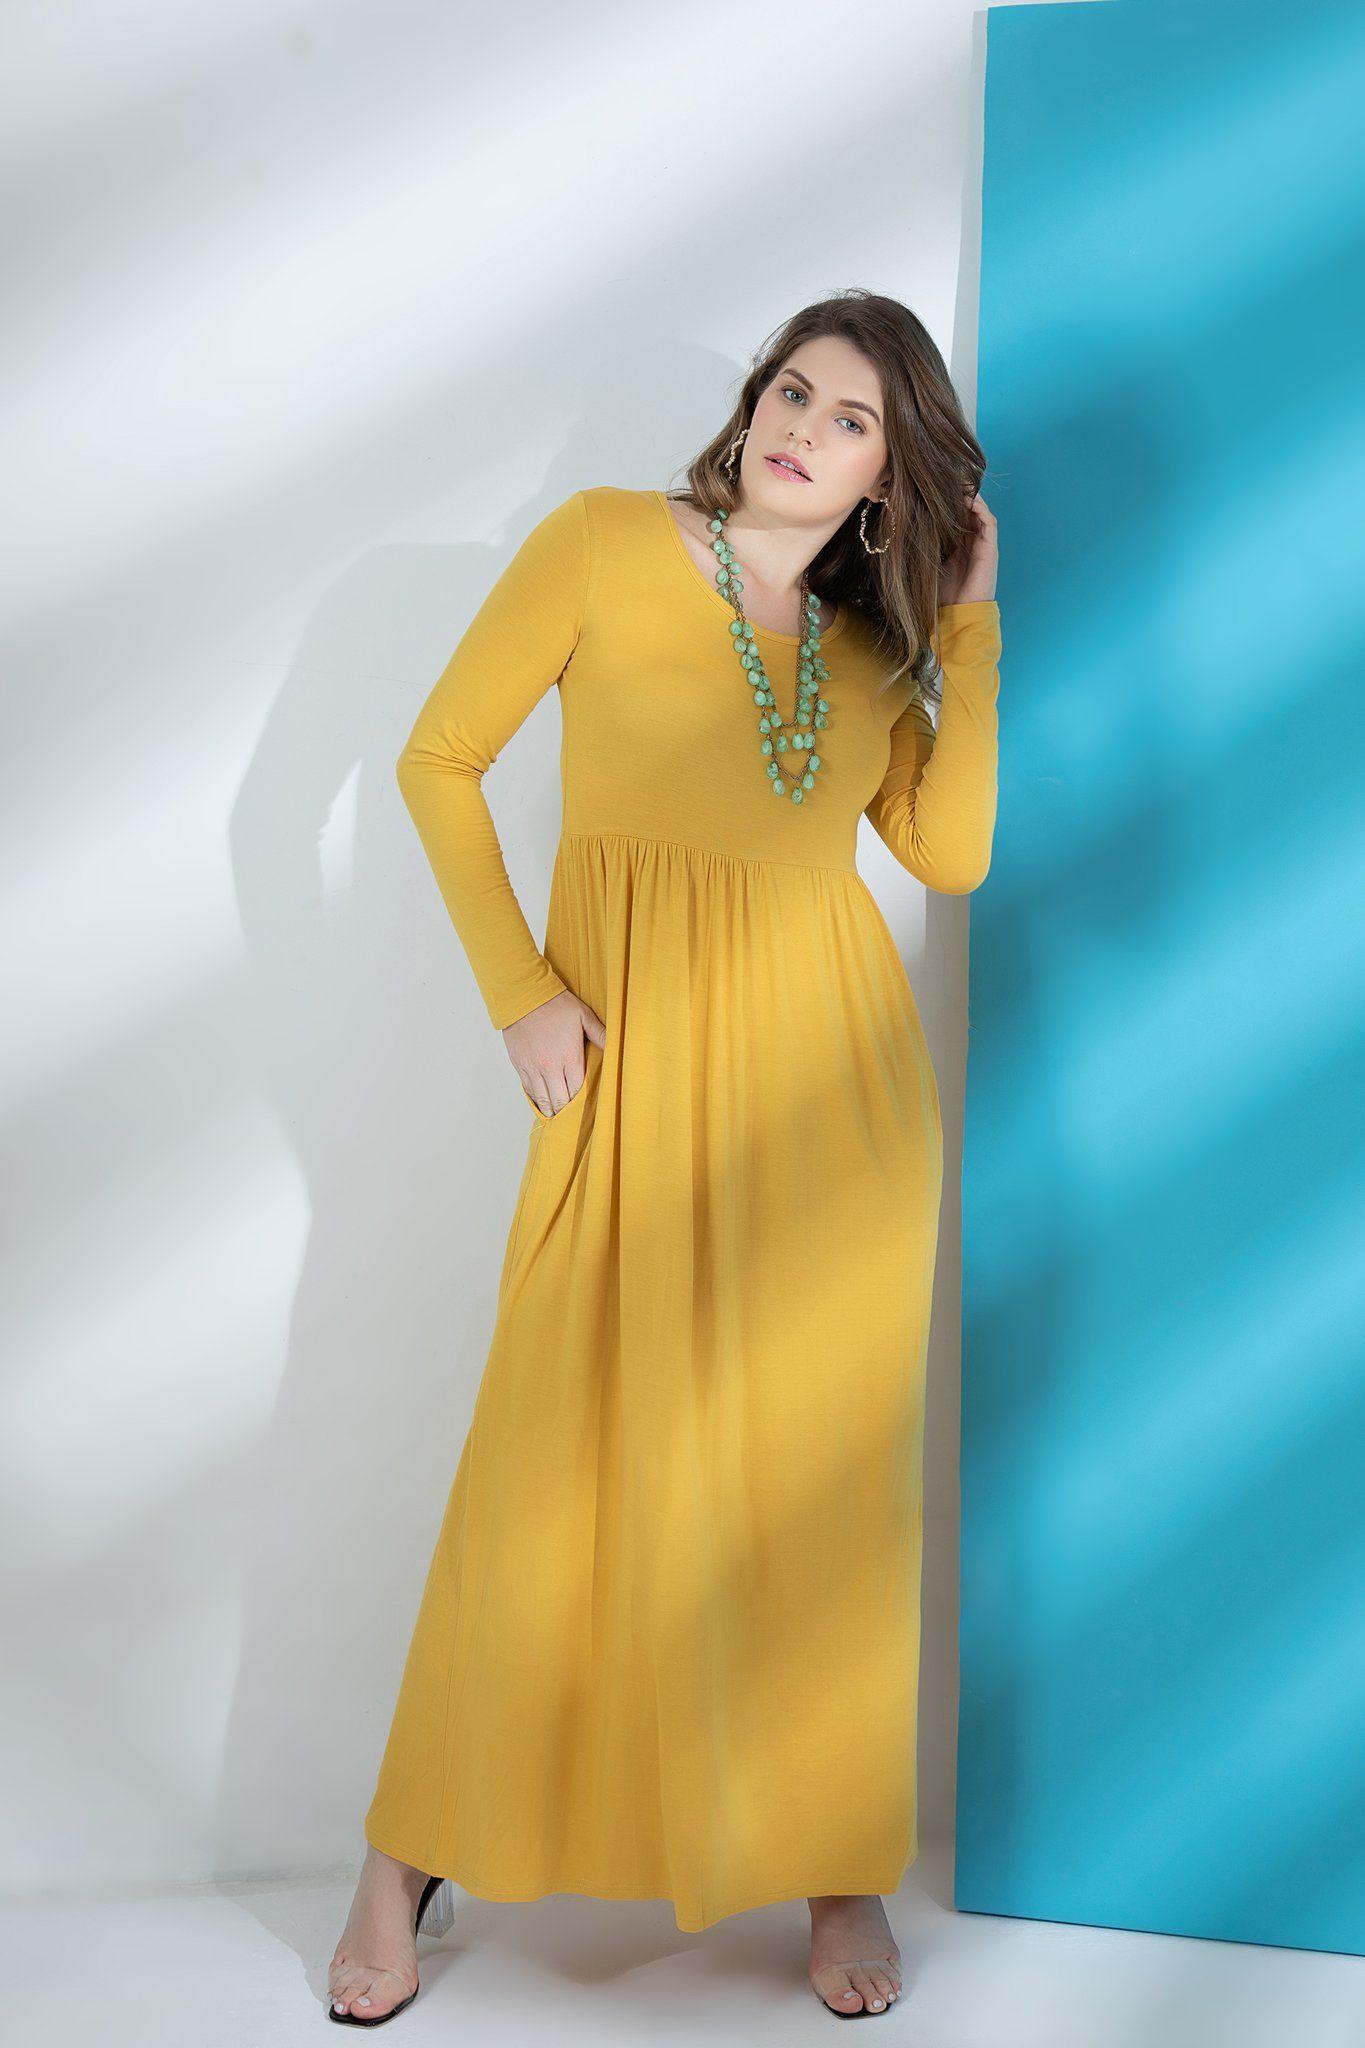 Larace Women Casual Long Sleeve Loose Plain Maxi Pockets Dresses Basic Larace Long Maxi Dress Burgundy Maxi Dress Plain Maxi Dress [ 2048 x 1365 Pixel ]